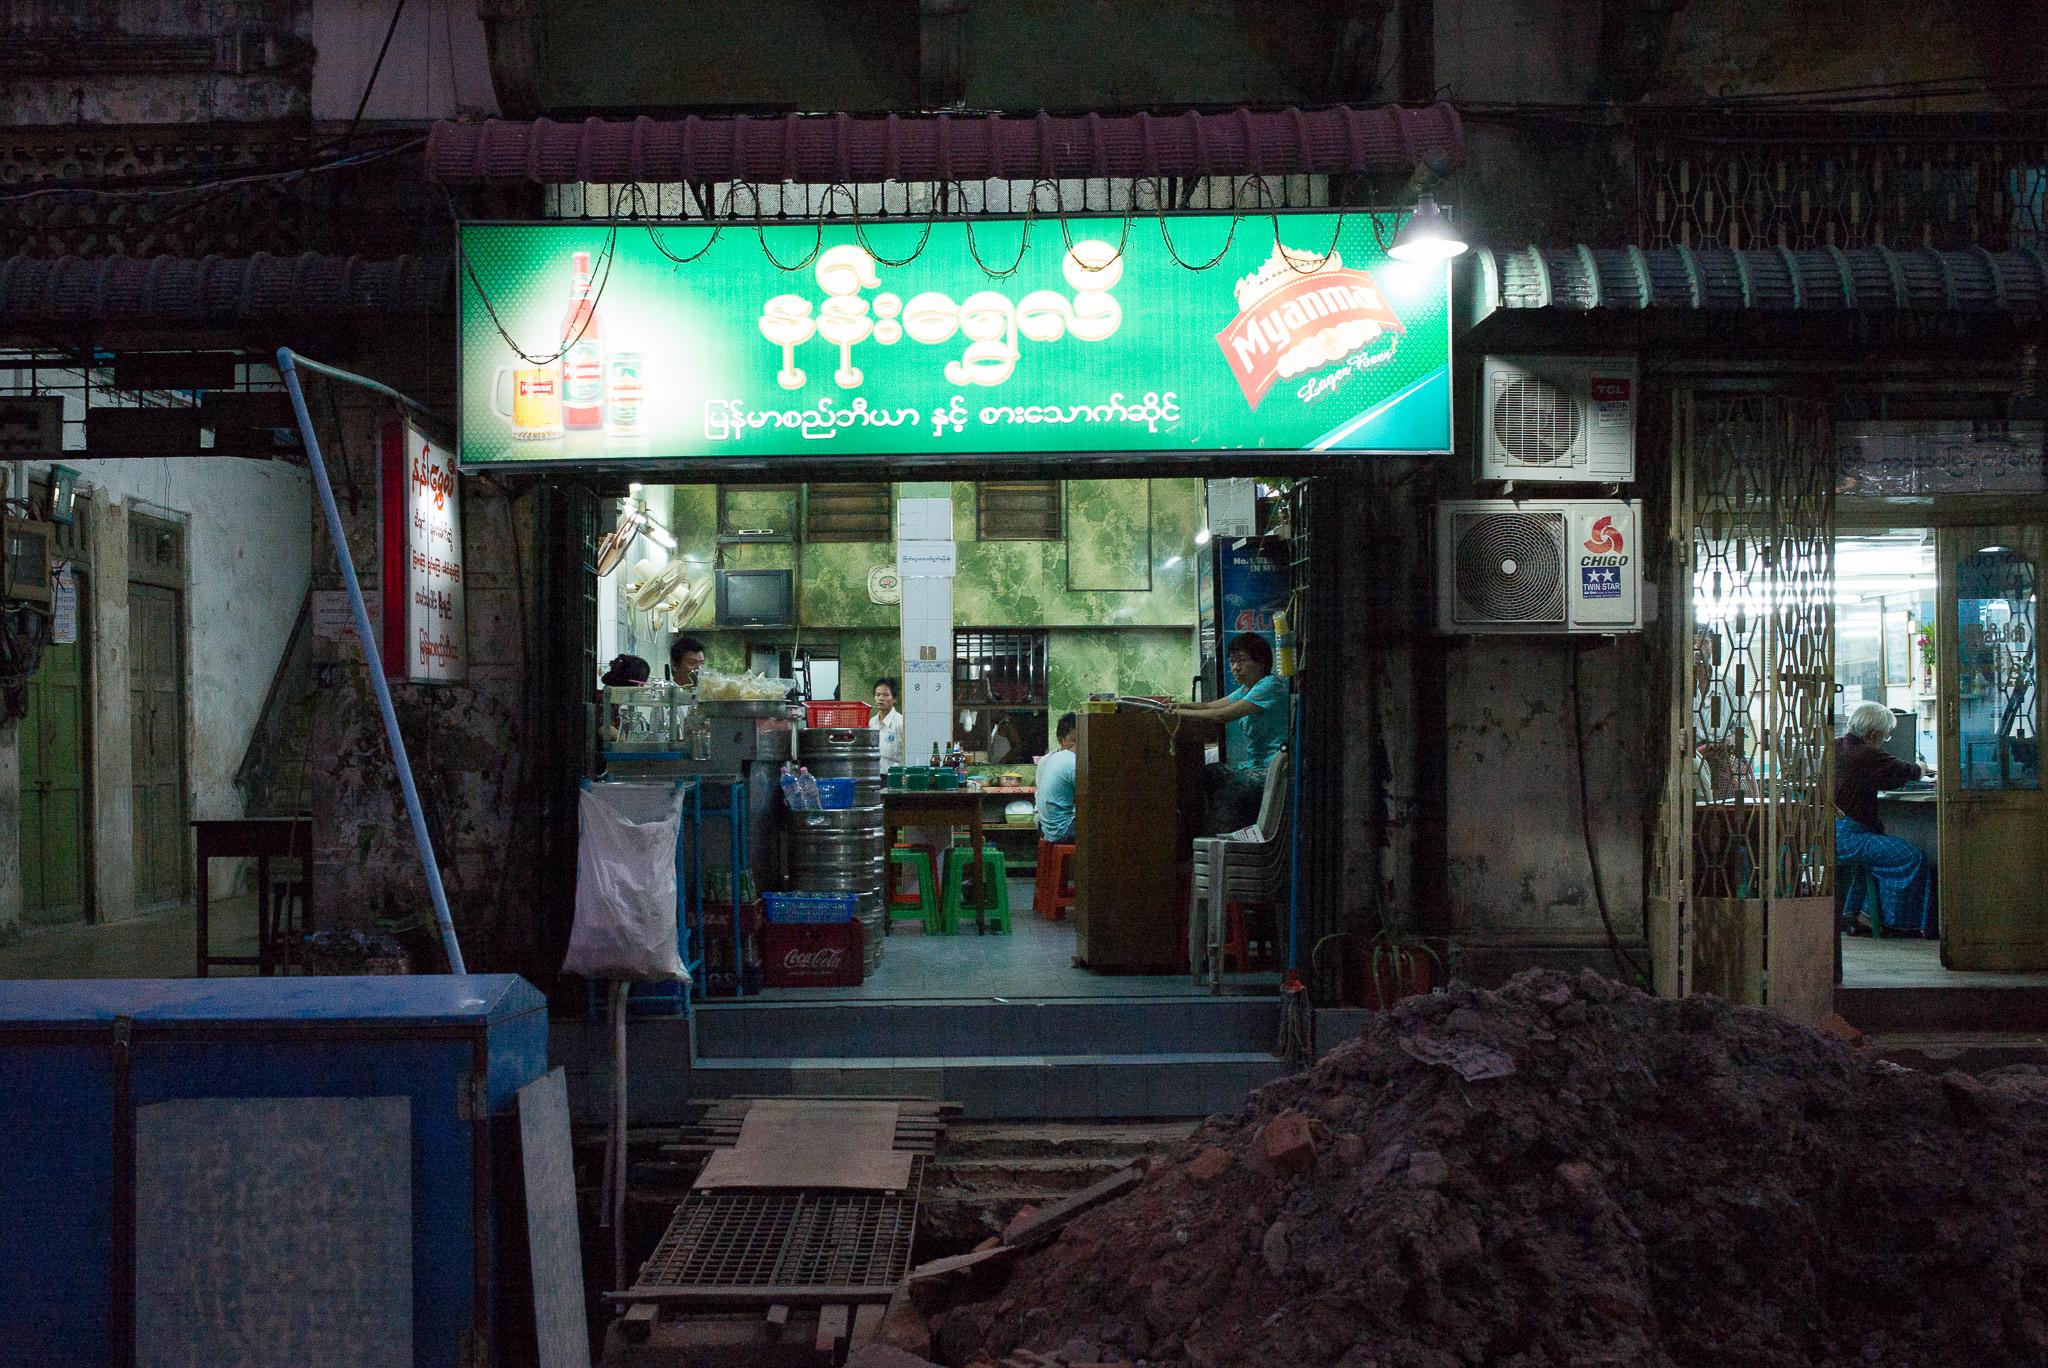 20-Burma-0320-P-1412.jpg